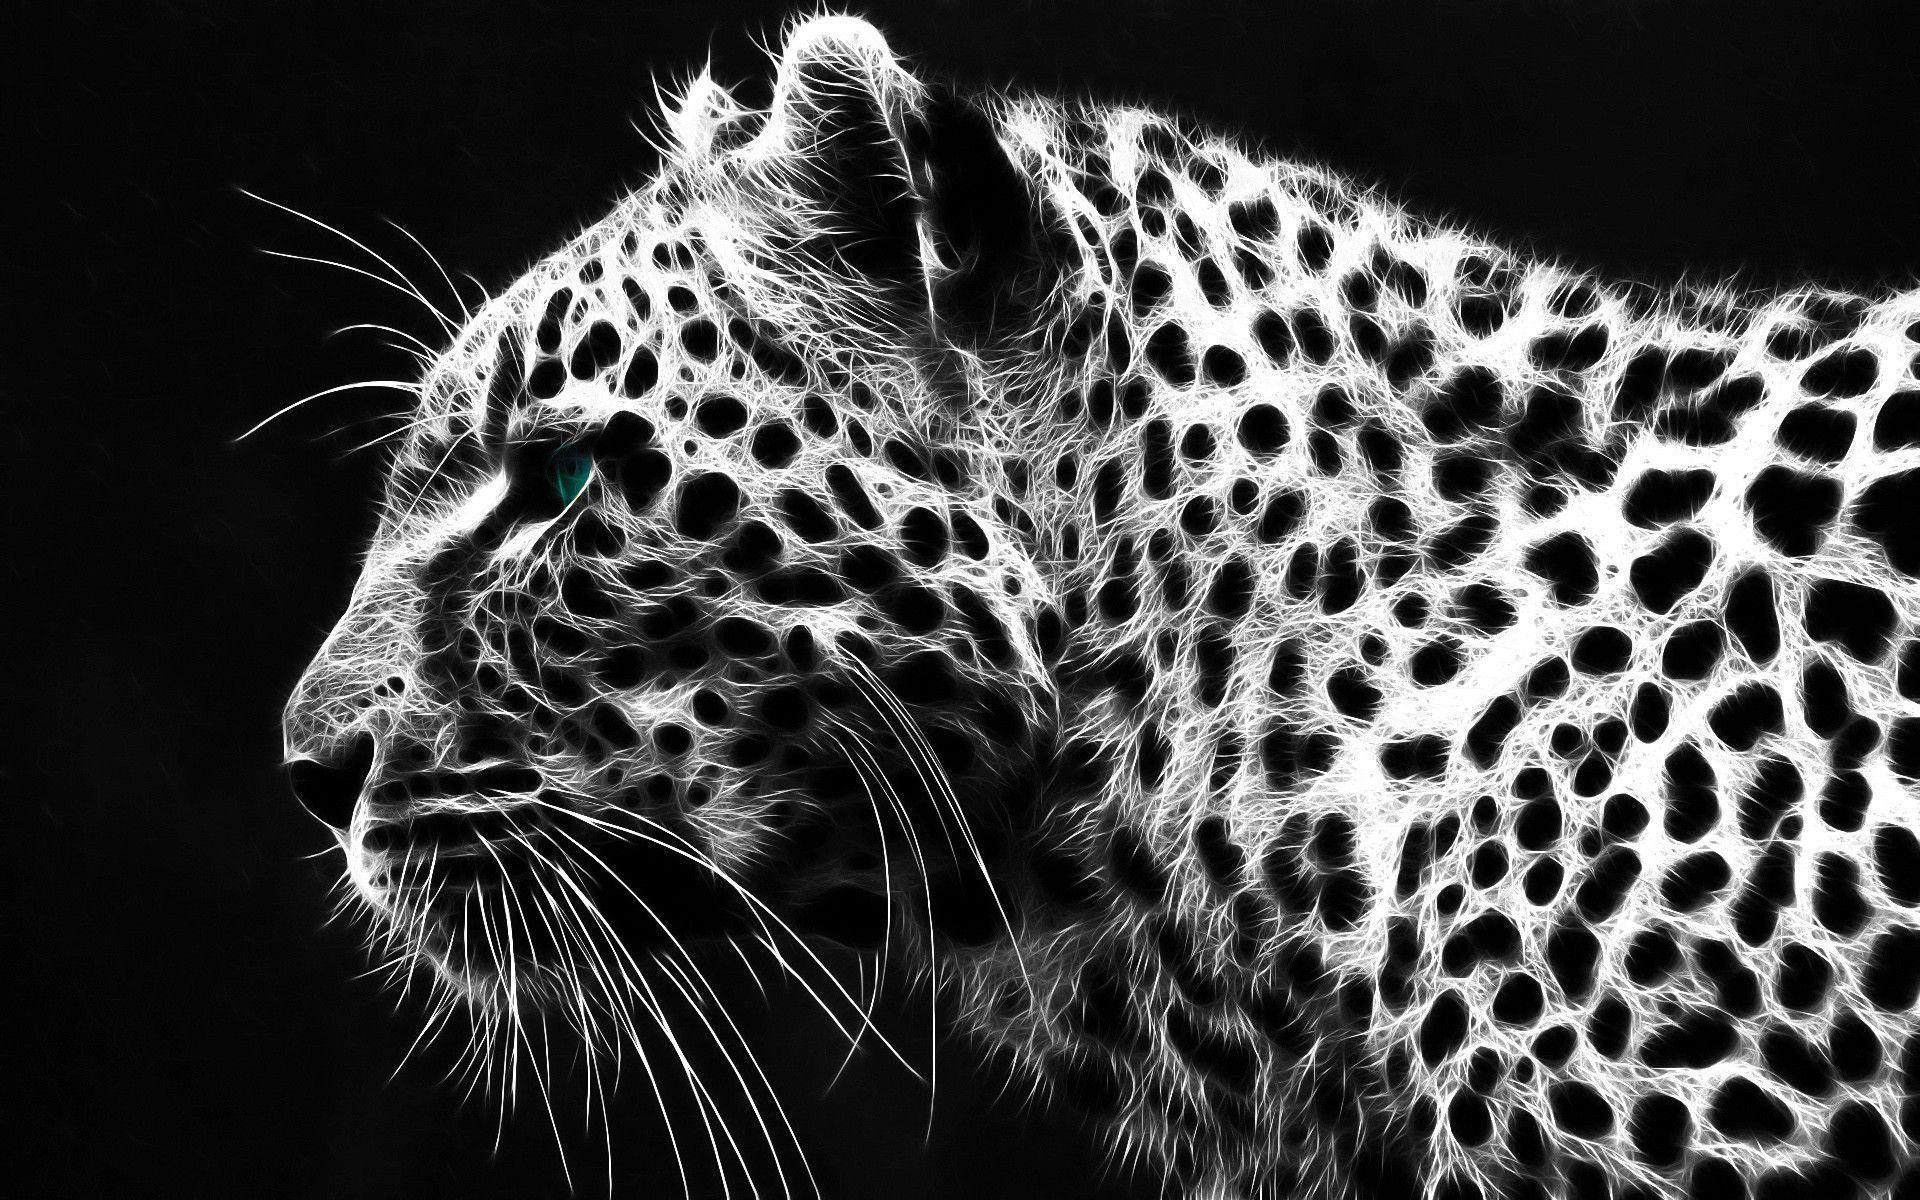 cheetah wallpapers hd - wallpaper cave